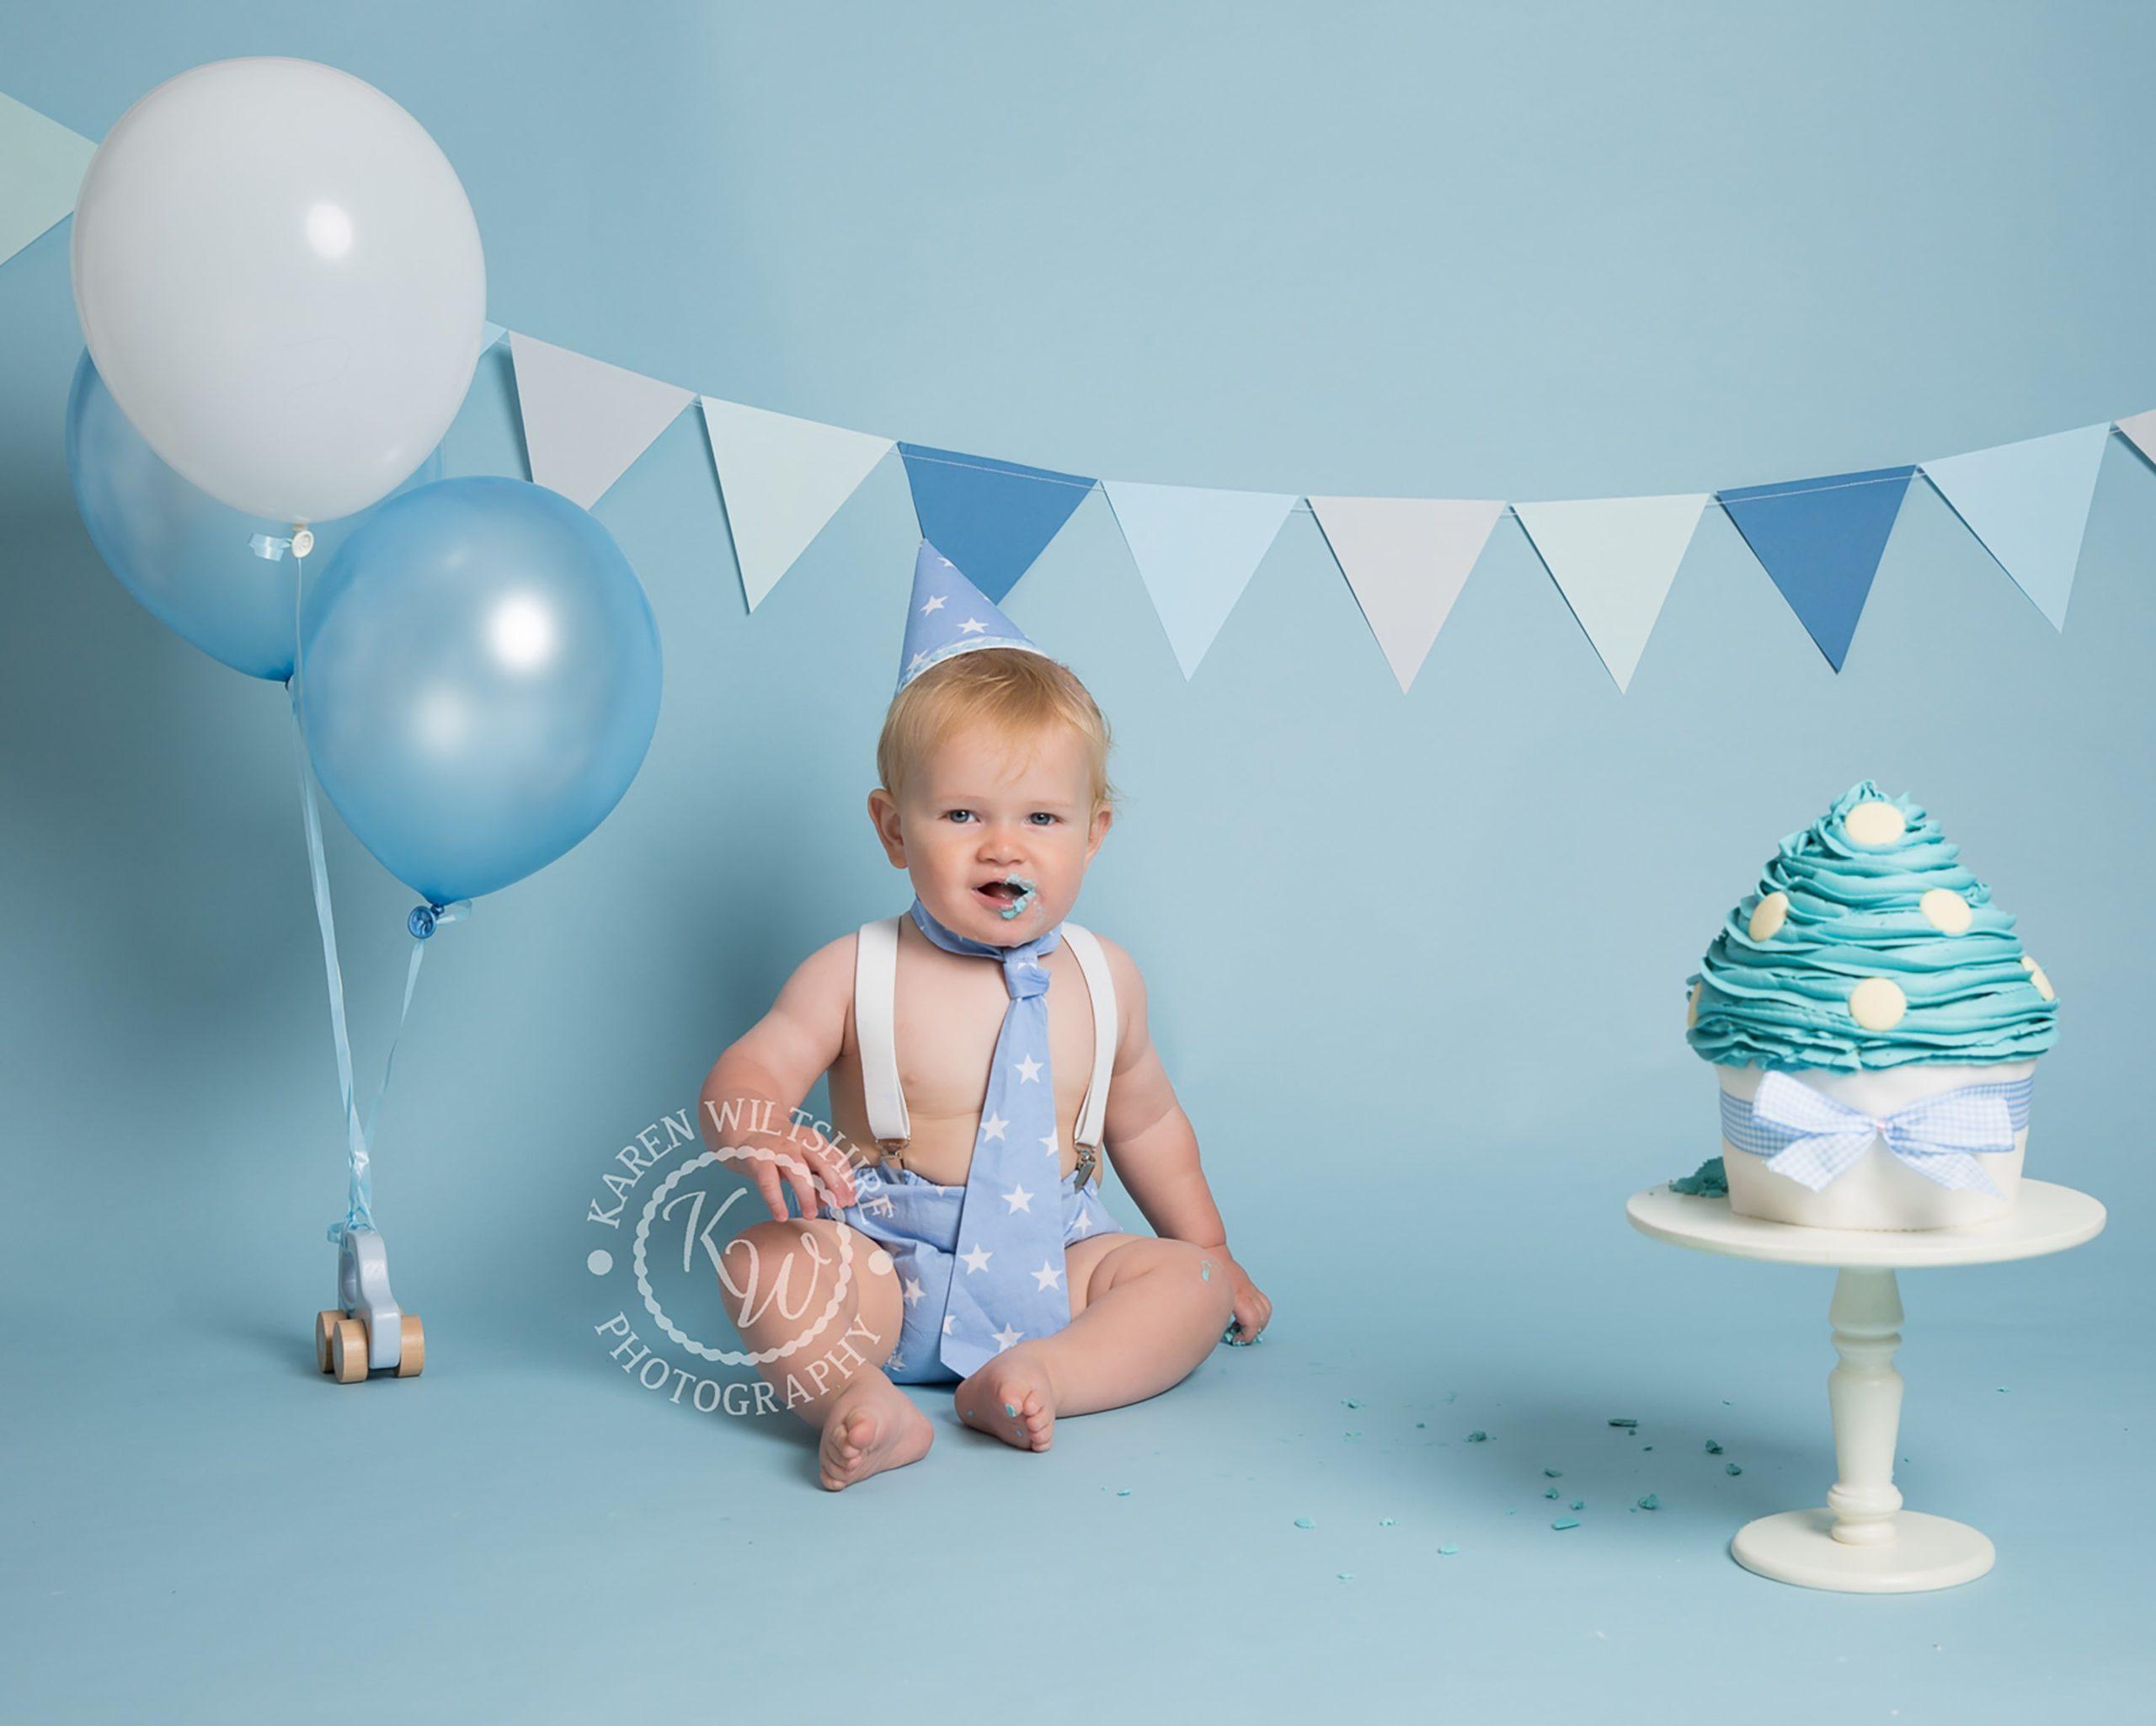 baby boy celebrates first birthday with a cake smash photoshoot